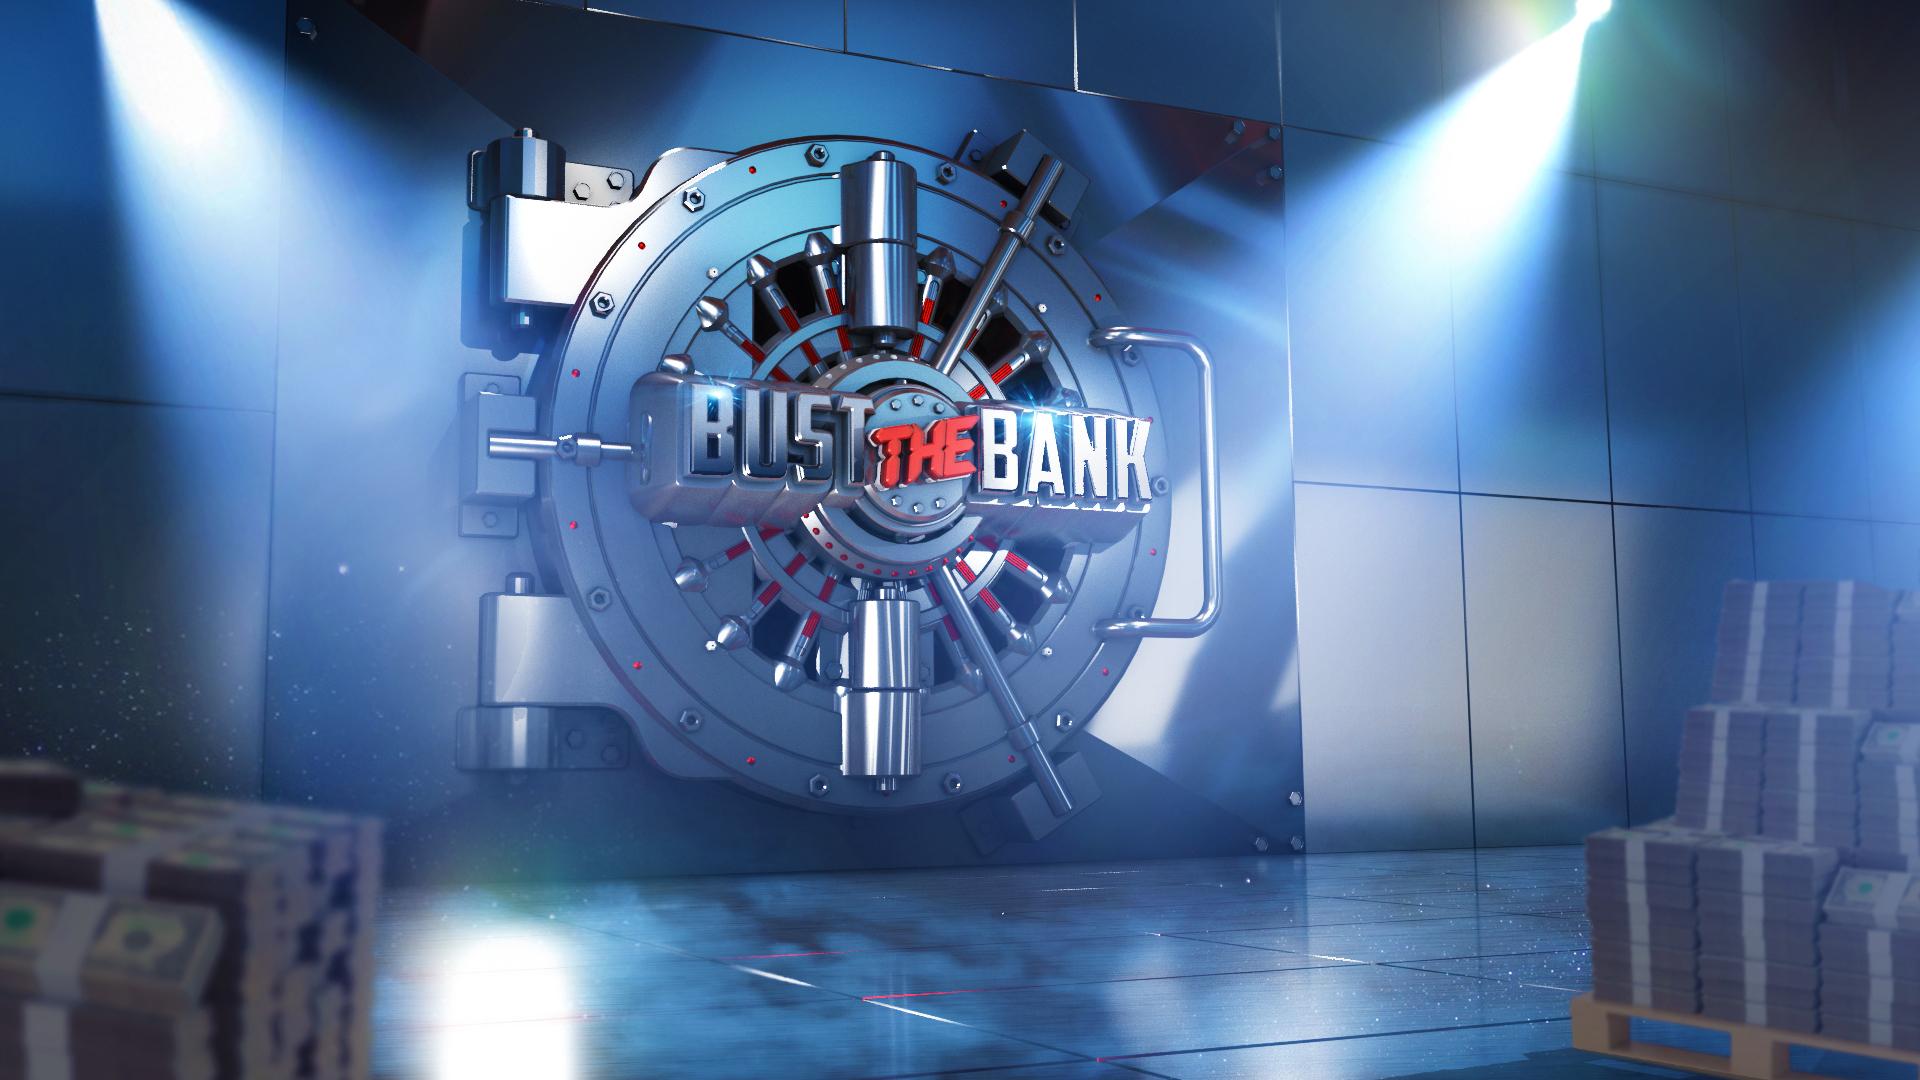 daniel-margiotta-bustthebank-conceptart-05.jpg